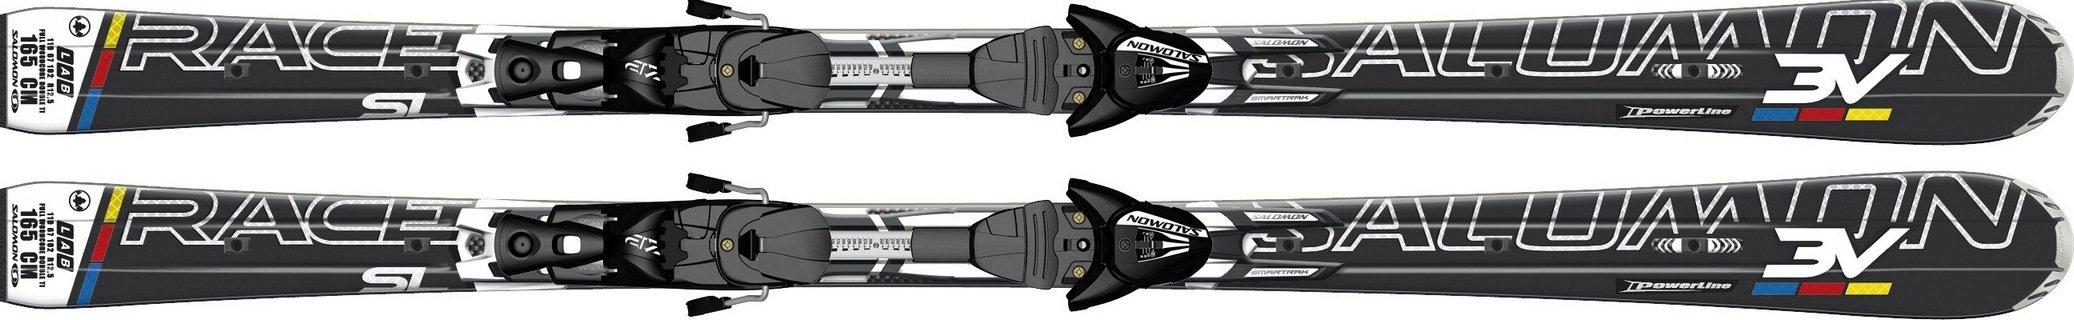 3V Race Powerline + Z12